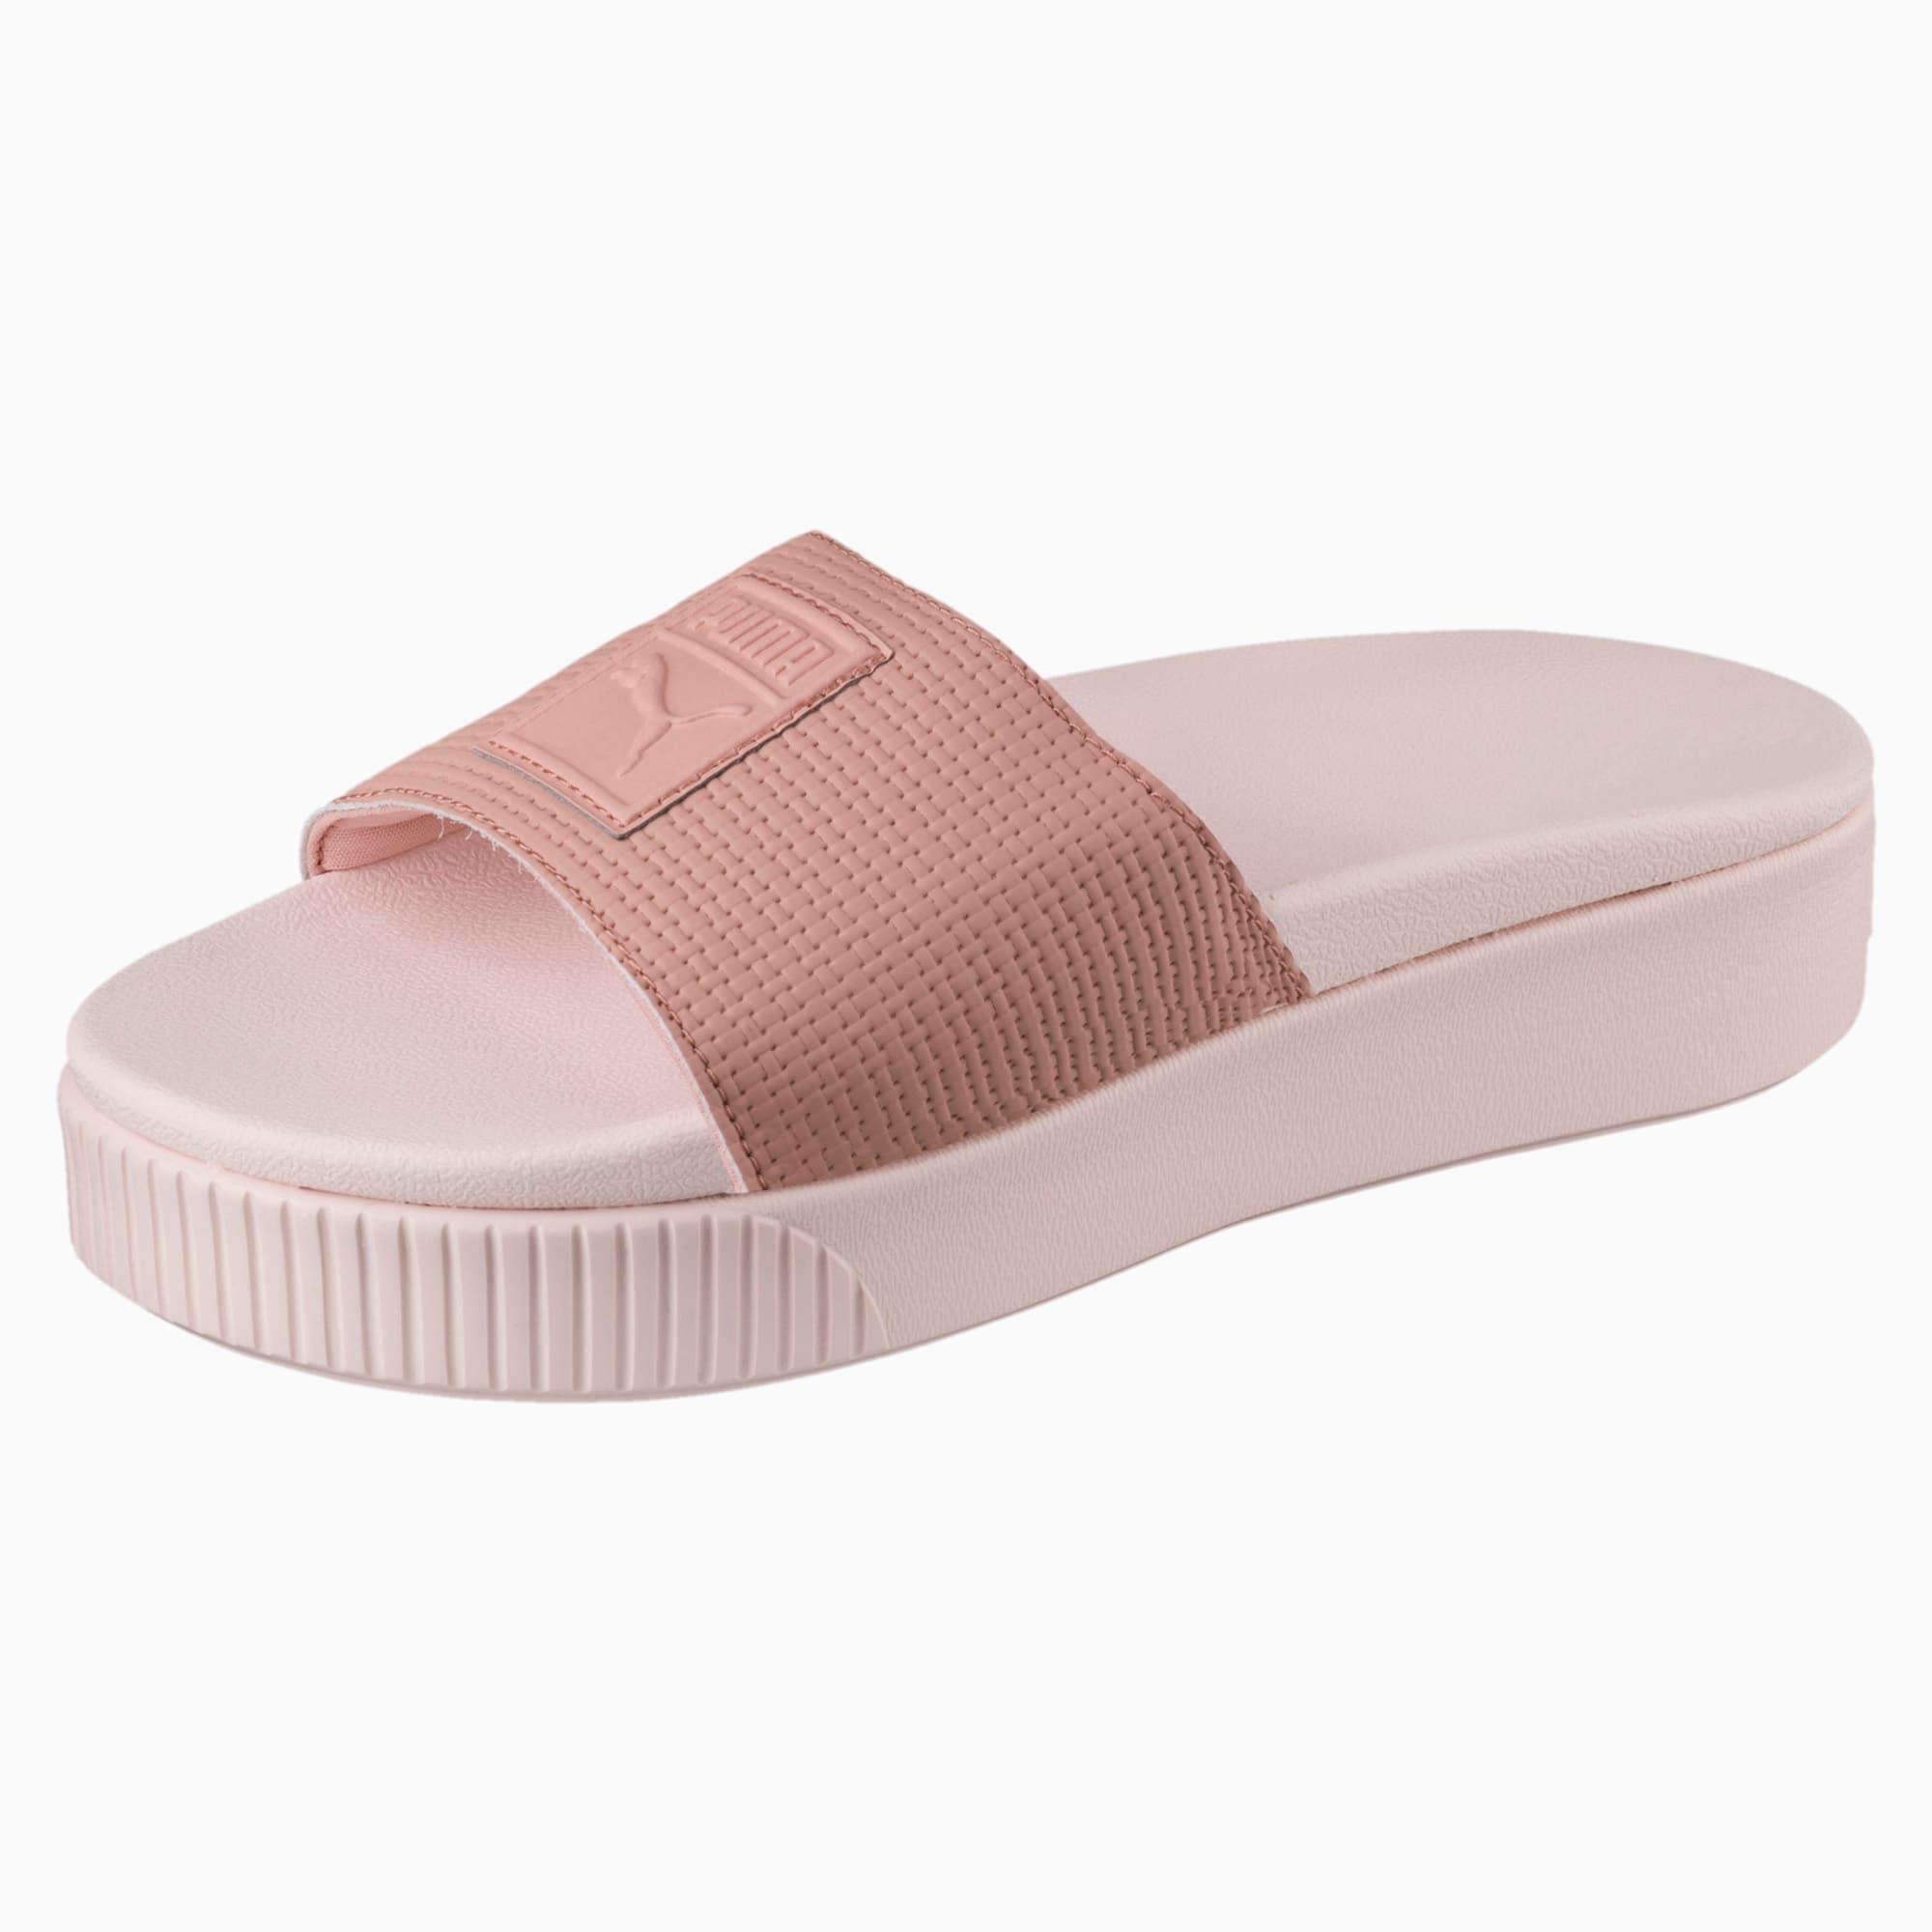 Platform Slide EP Women's Sandals